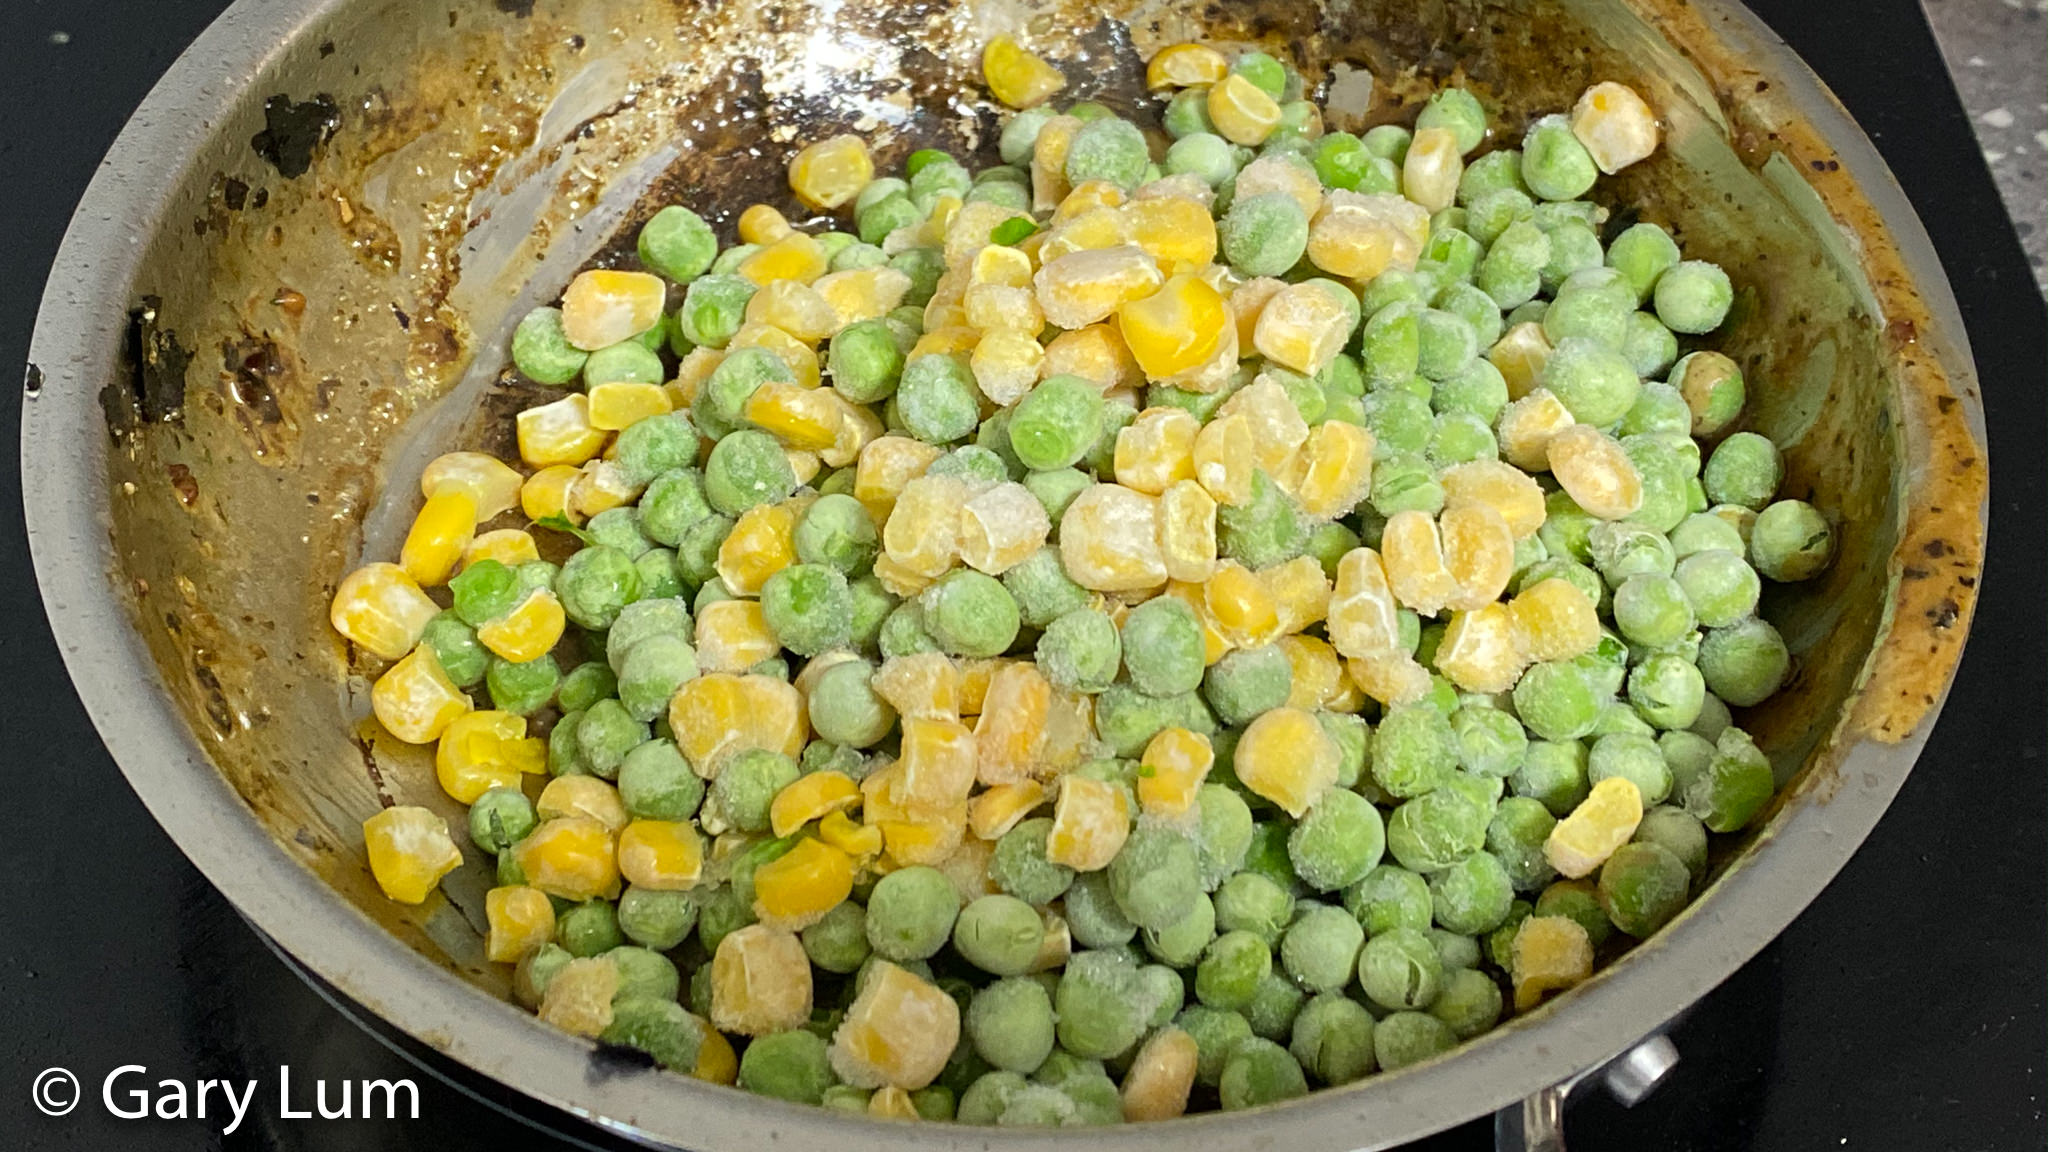 Frozen green and gold vegetables. Gary Lum.